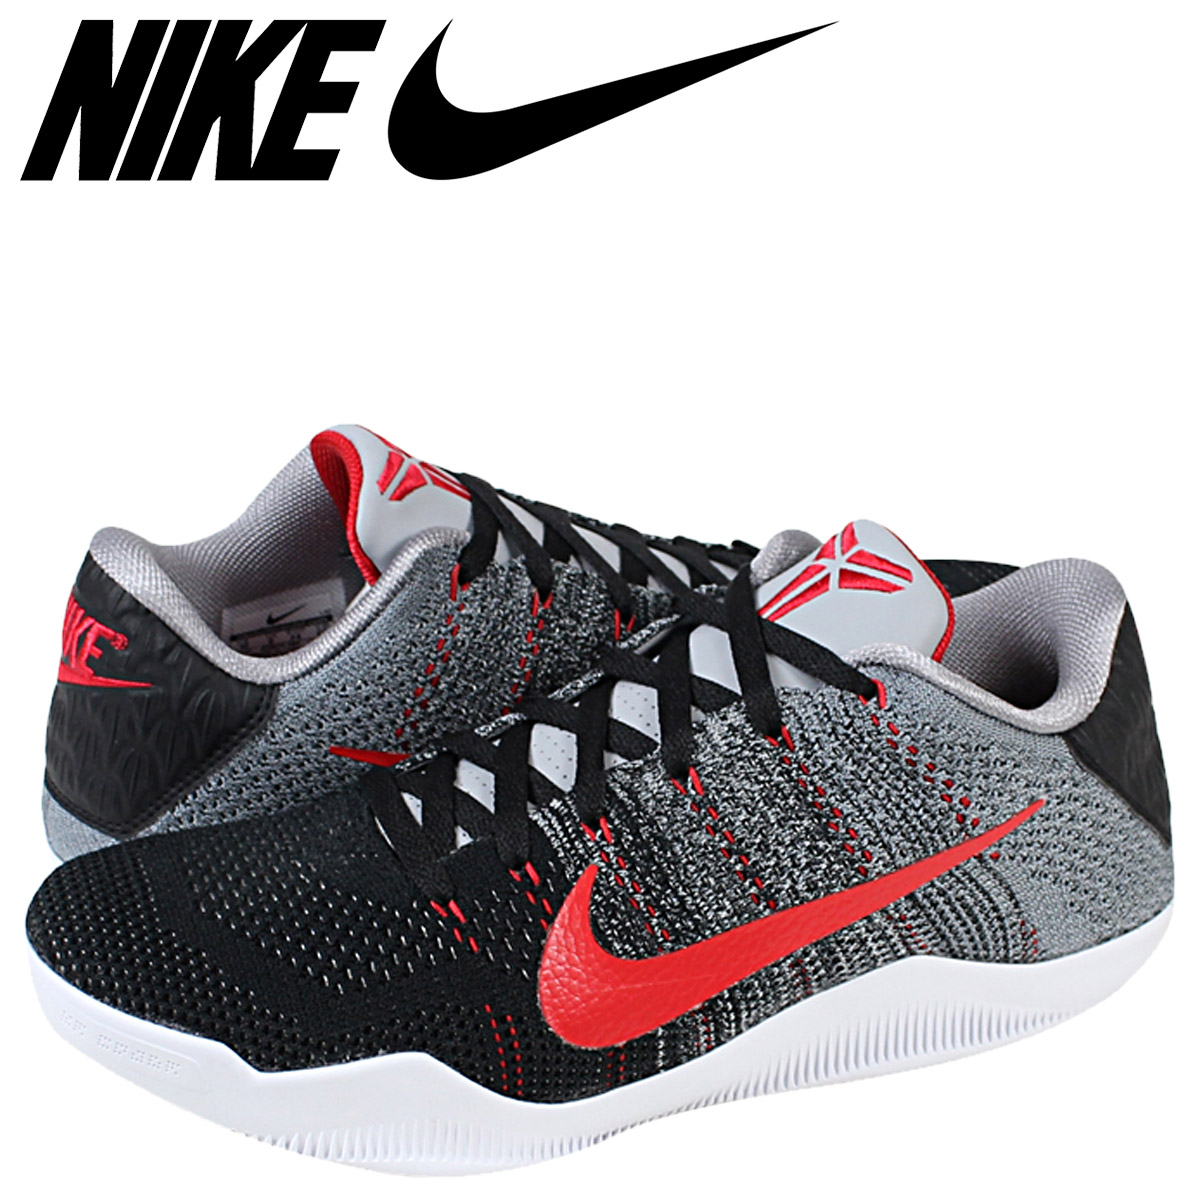 ALLSPORTS  NIKE Nike Kobe sneakers KOBE XI ELITE LOW TINKER HATFIELD 822675- 060 grey mens  8026e6d91